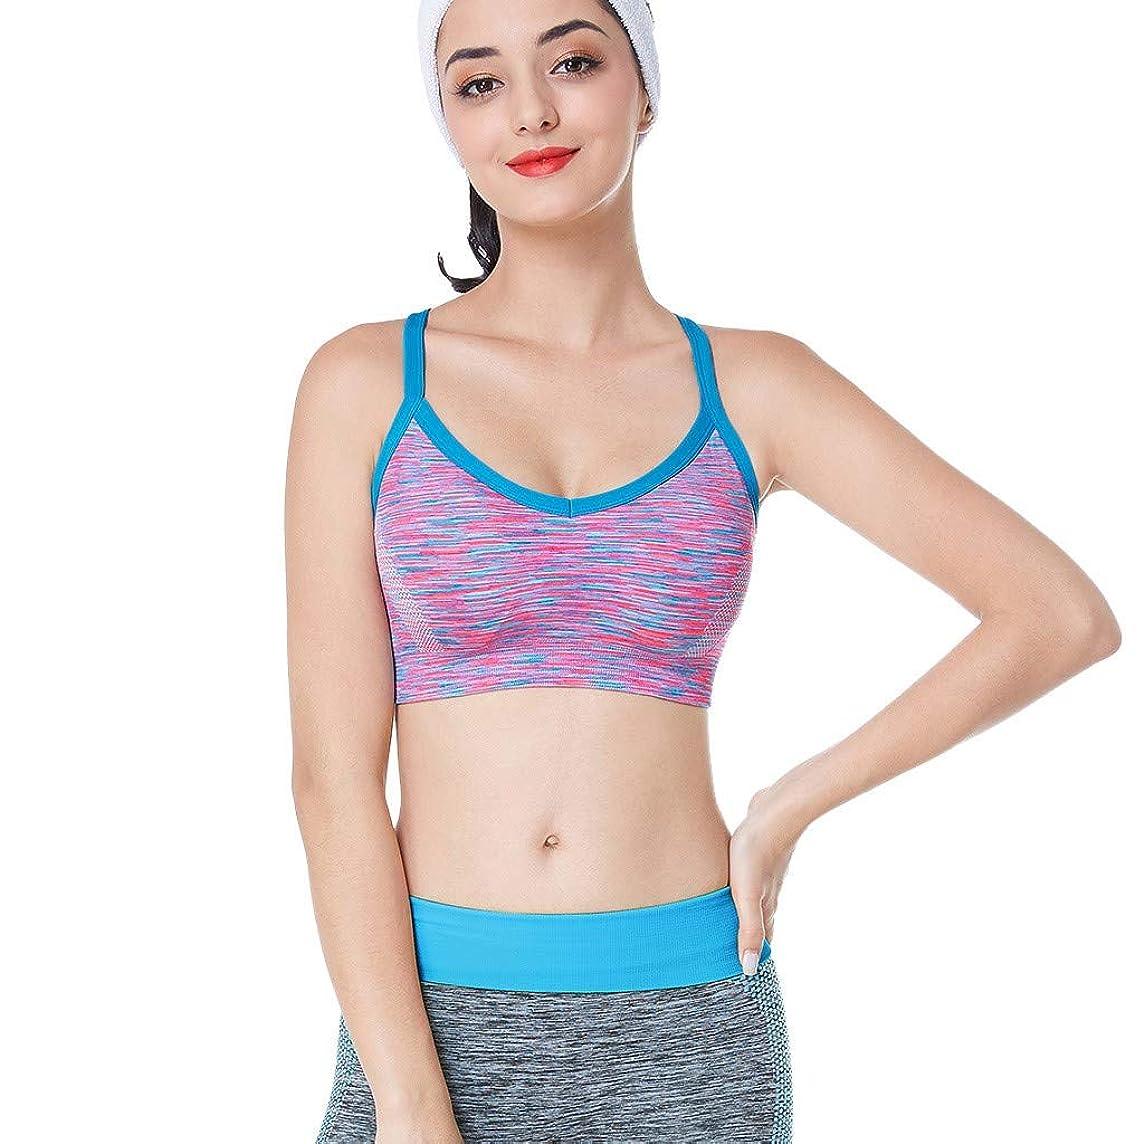 FANORAD Bras for Women, Yoga Bras Tank Tops, Seamless, Woman Sleeveless Sports Tops Sexy Sportswear Vest